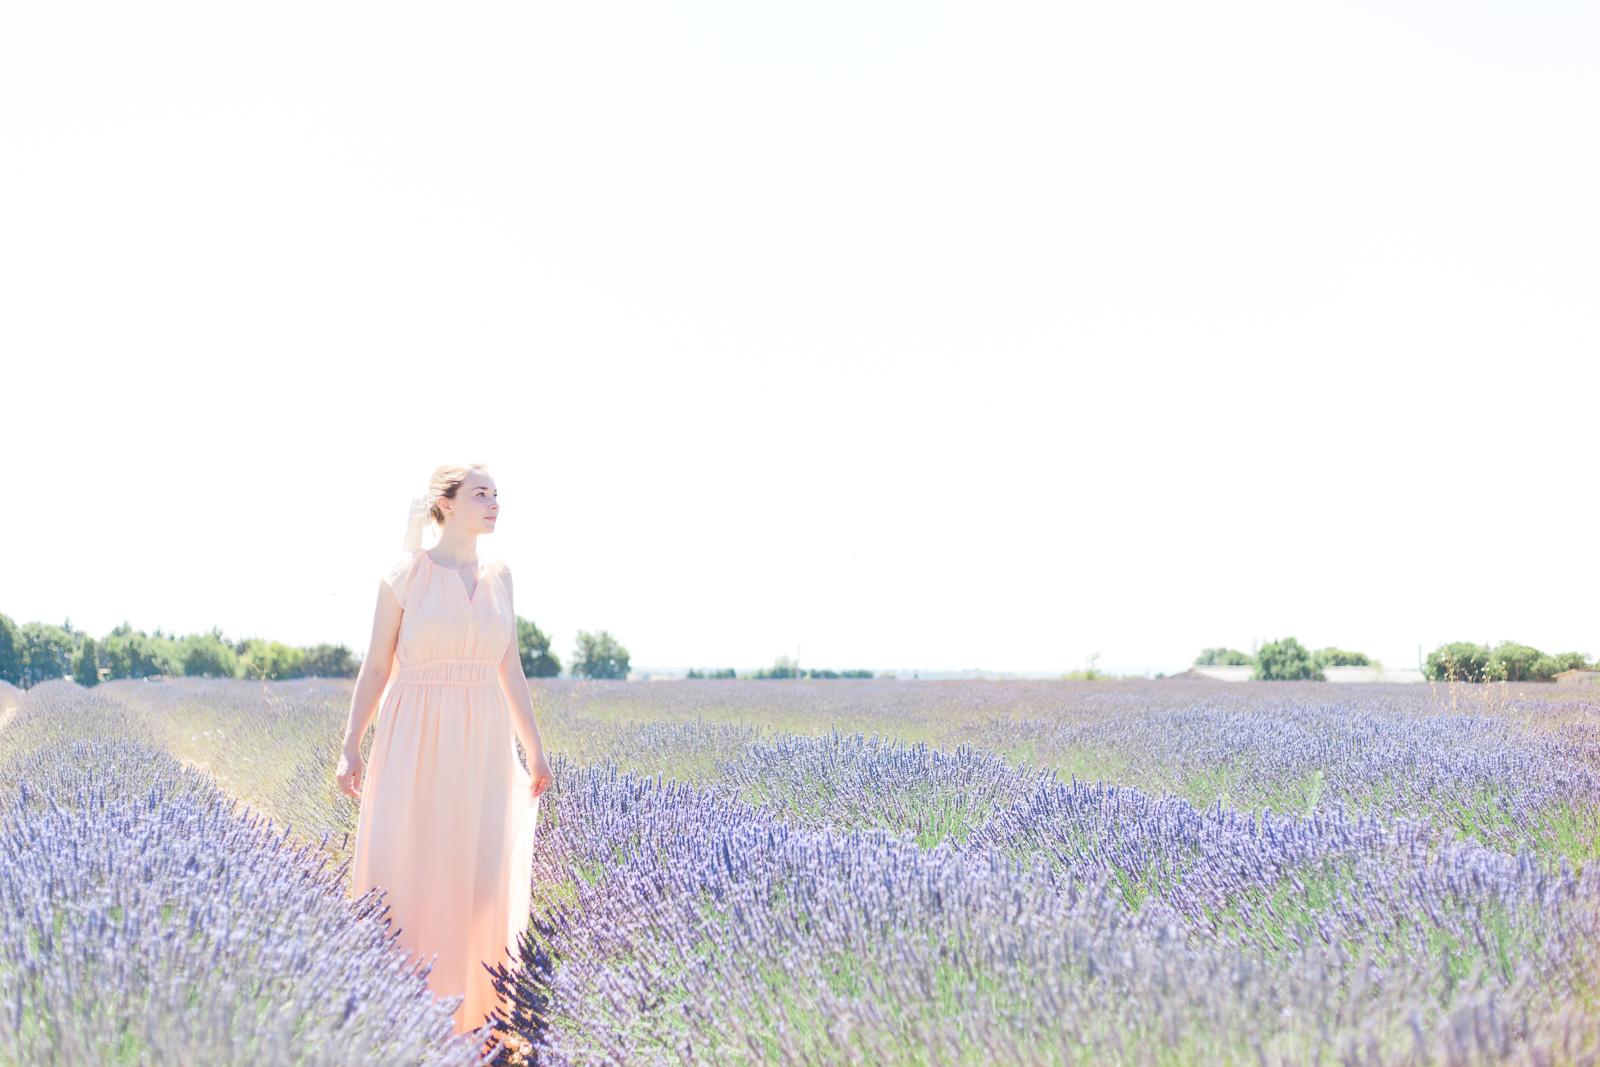 Wedding Photographer, Lavender Fields, Southern France, Matt Erickson Photography, Destination Wedding Photographer, France, Provence